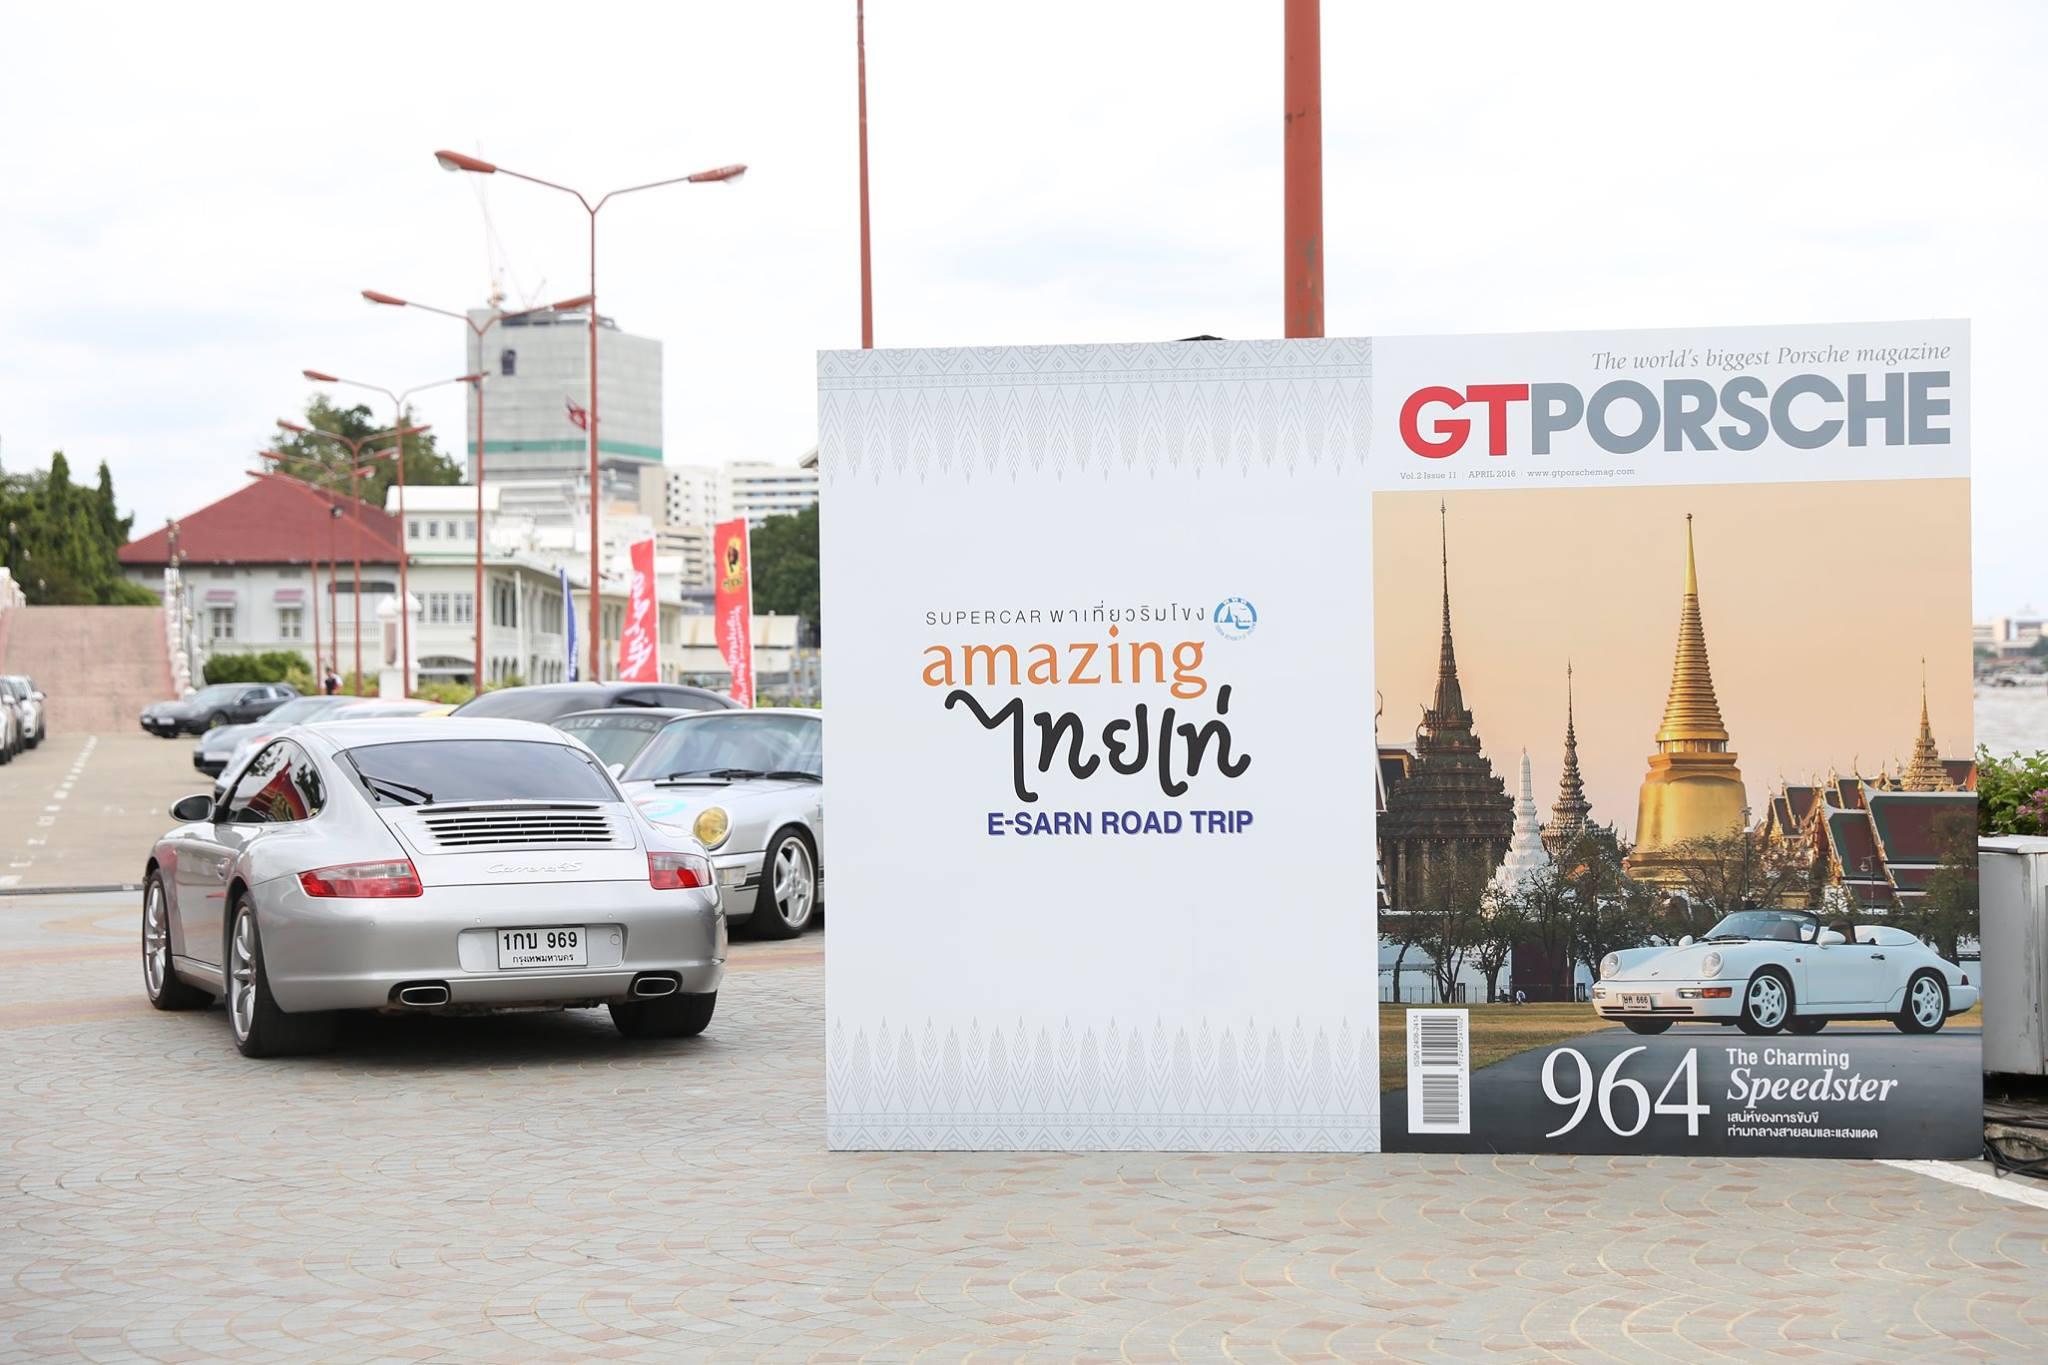 "GTPORSCHE ร่วมกับ ททท. เปิดตัวแคมเปญ ""SUPERCAR พาเที่ยวริมโขง : อิสานโรดทริป 2018"" 13 -"